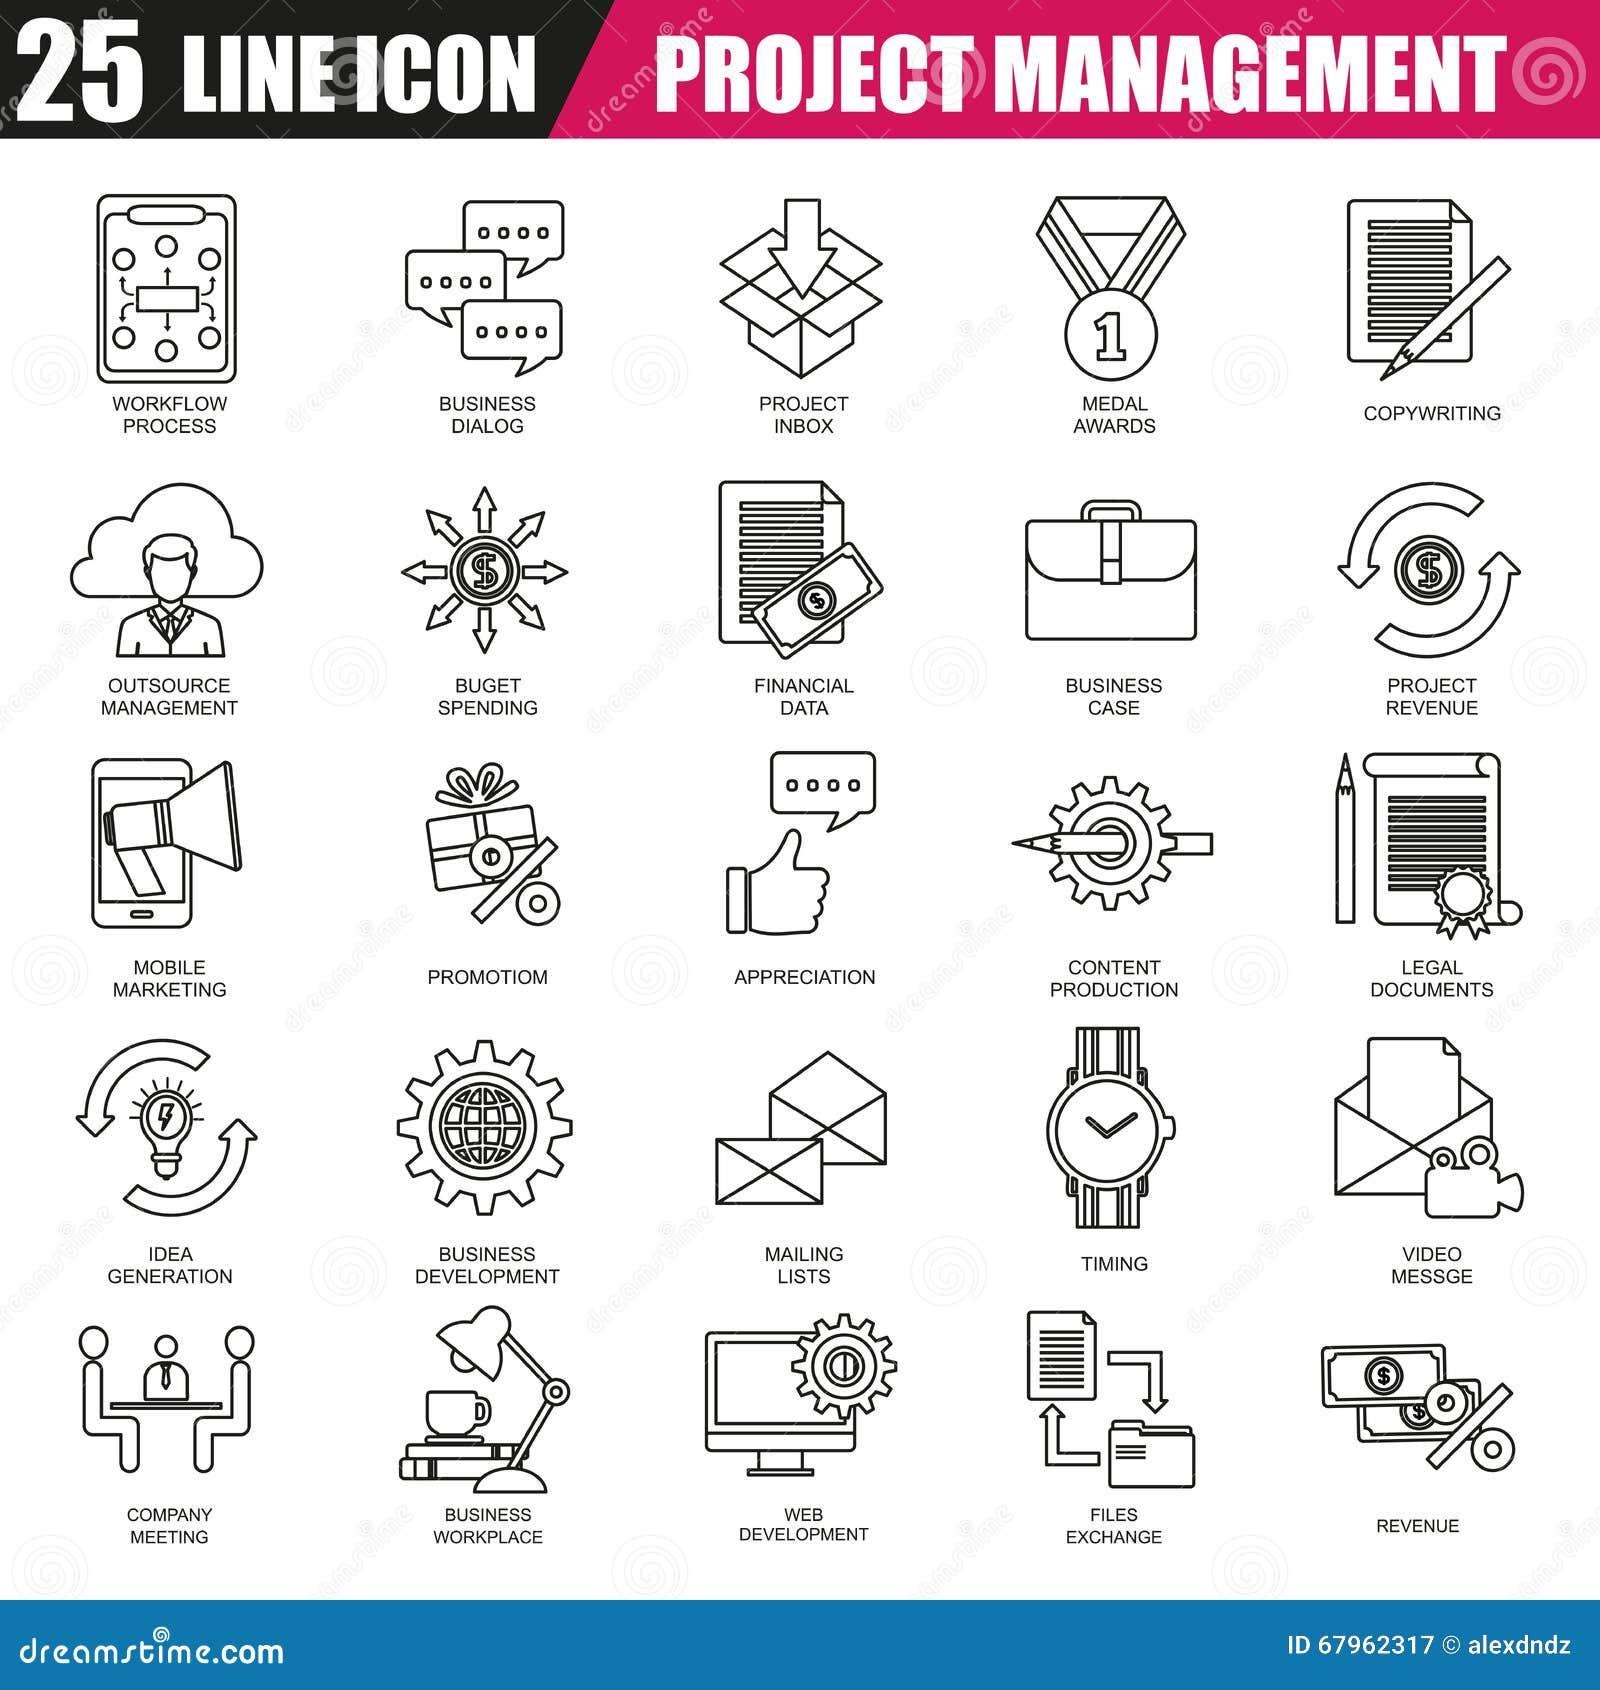 Project Management Line Icon Set Vector Illustration